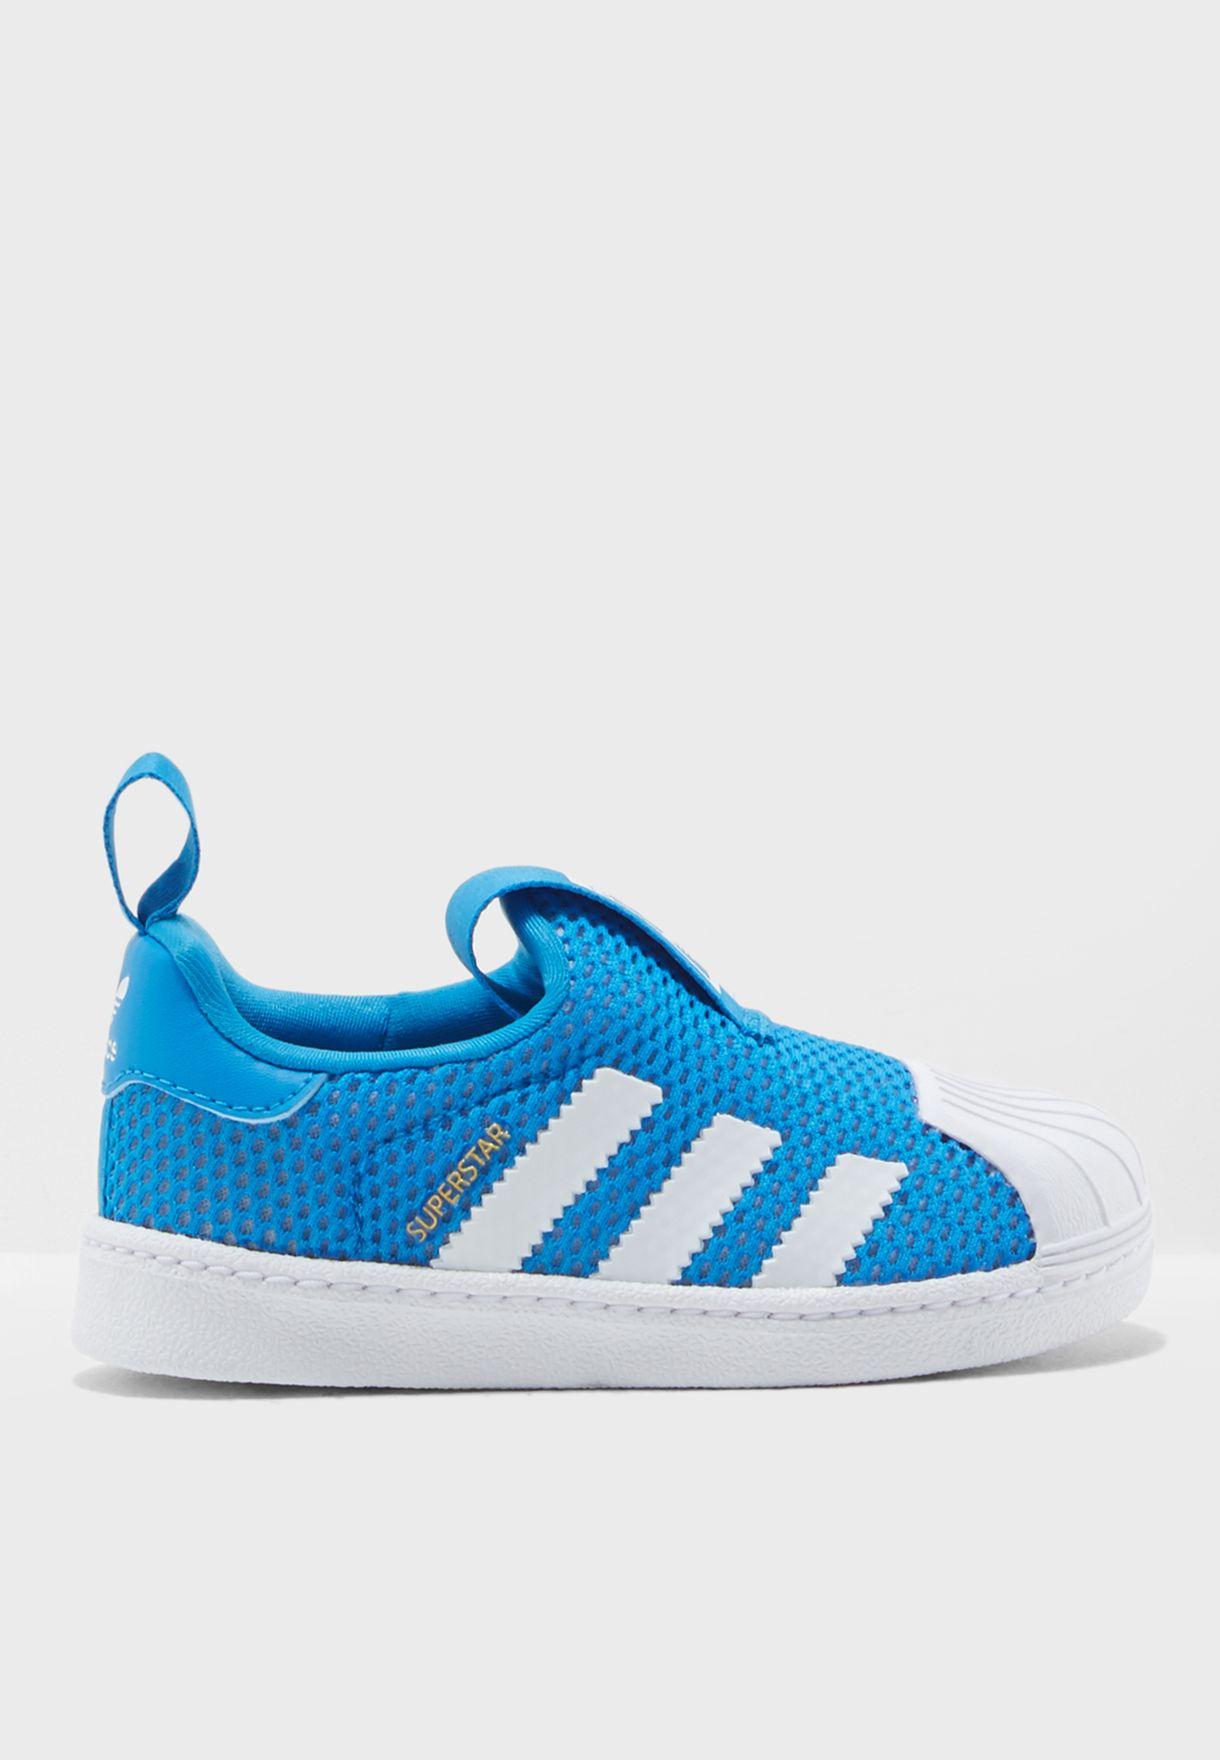 4c002c2a5e679 Shop adidas Originals blue Infant Superstar 360 B37252 for Kids in ...